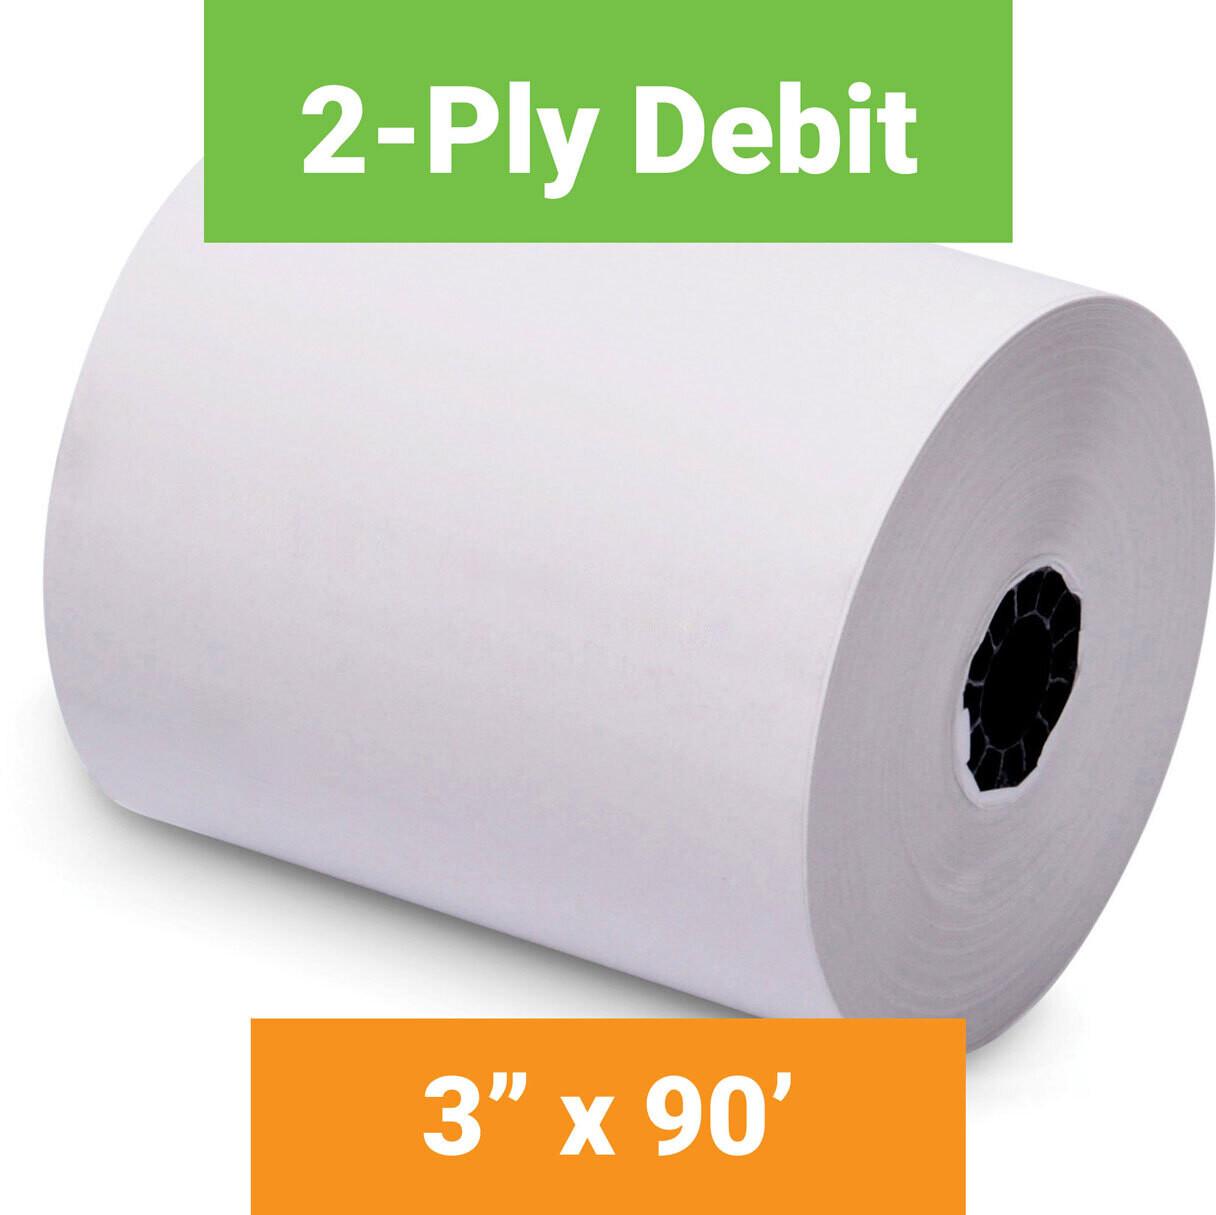 "Paper, 2-Ply Debit, 3"" x 90' White, 5 Pack"